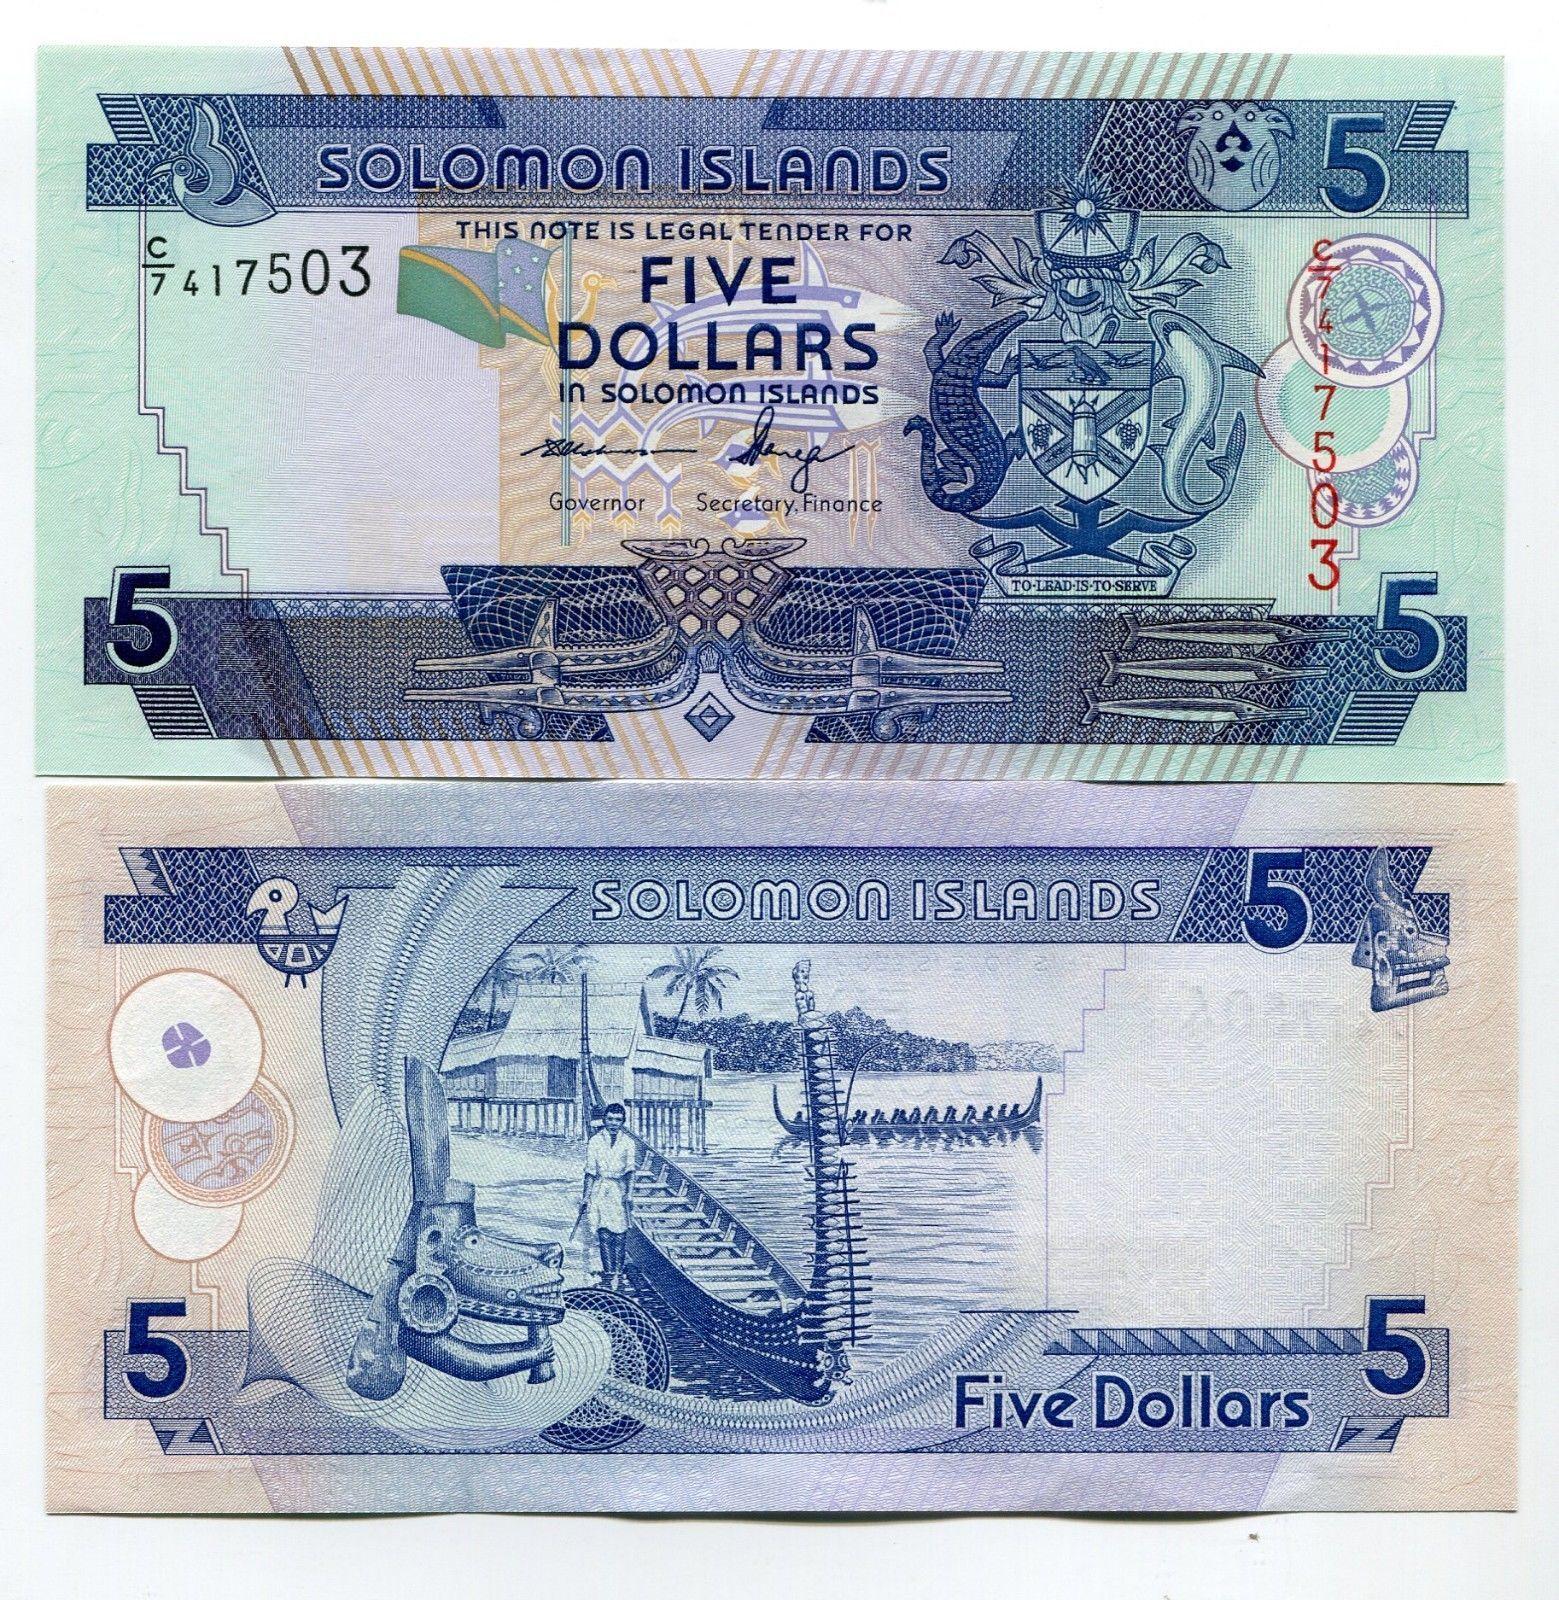 Solomon Islands 5 Dollars Nd C 7 P 26 New Unc